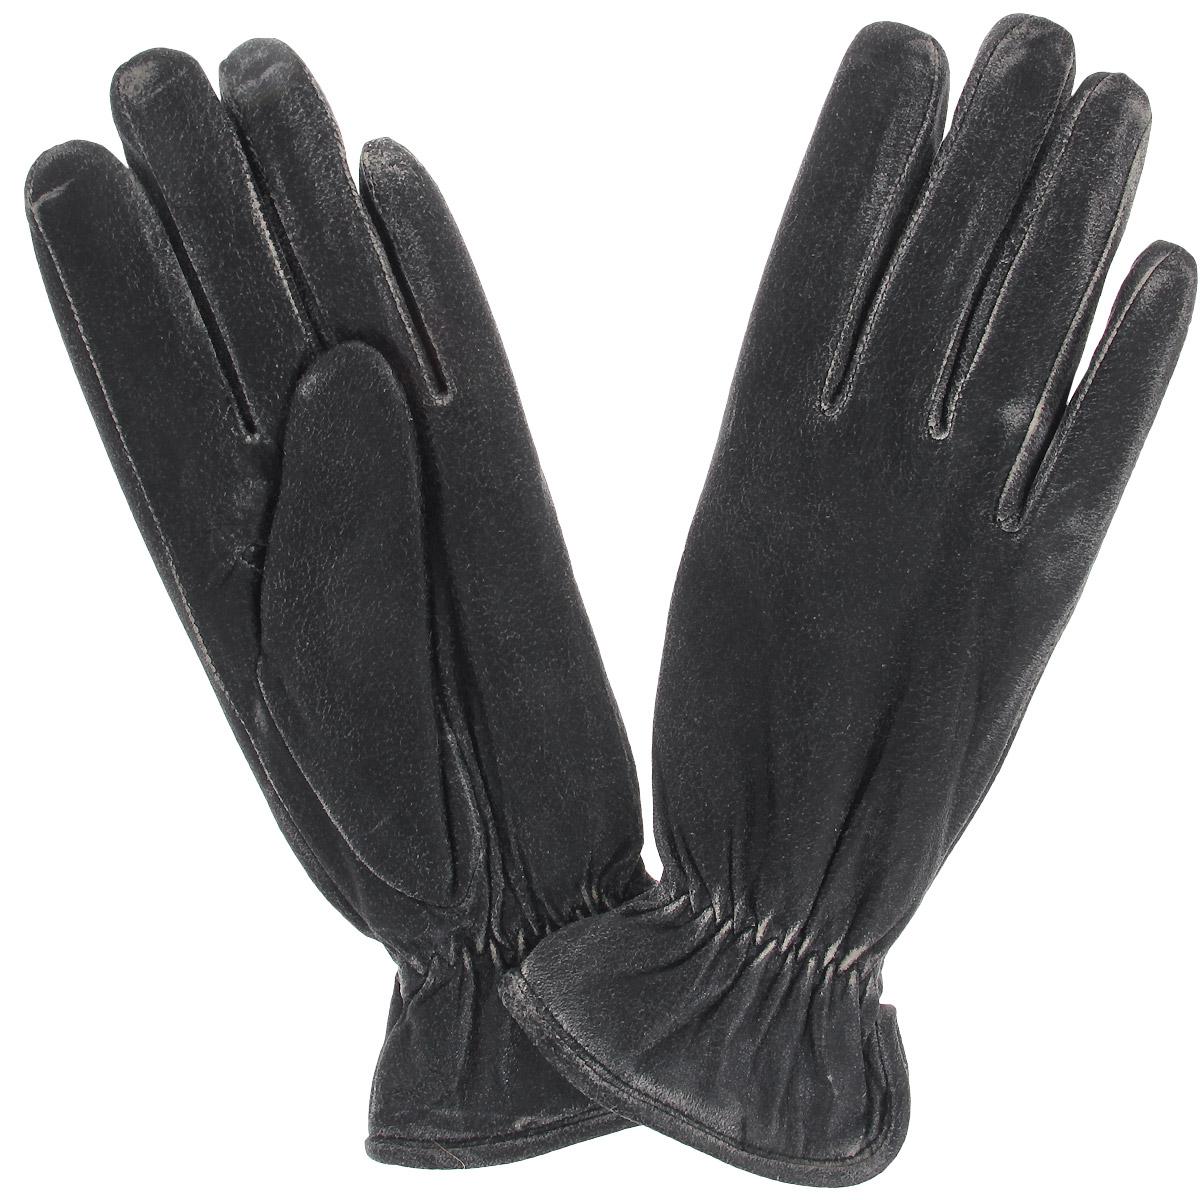 Фото - Перчатки женские Dali Exclusive, цвет: серый. VIALE/MEL. Размер 8 женские перчатки imixlot acylic ca02009 mu